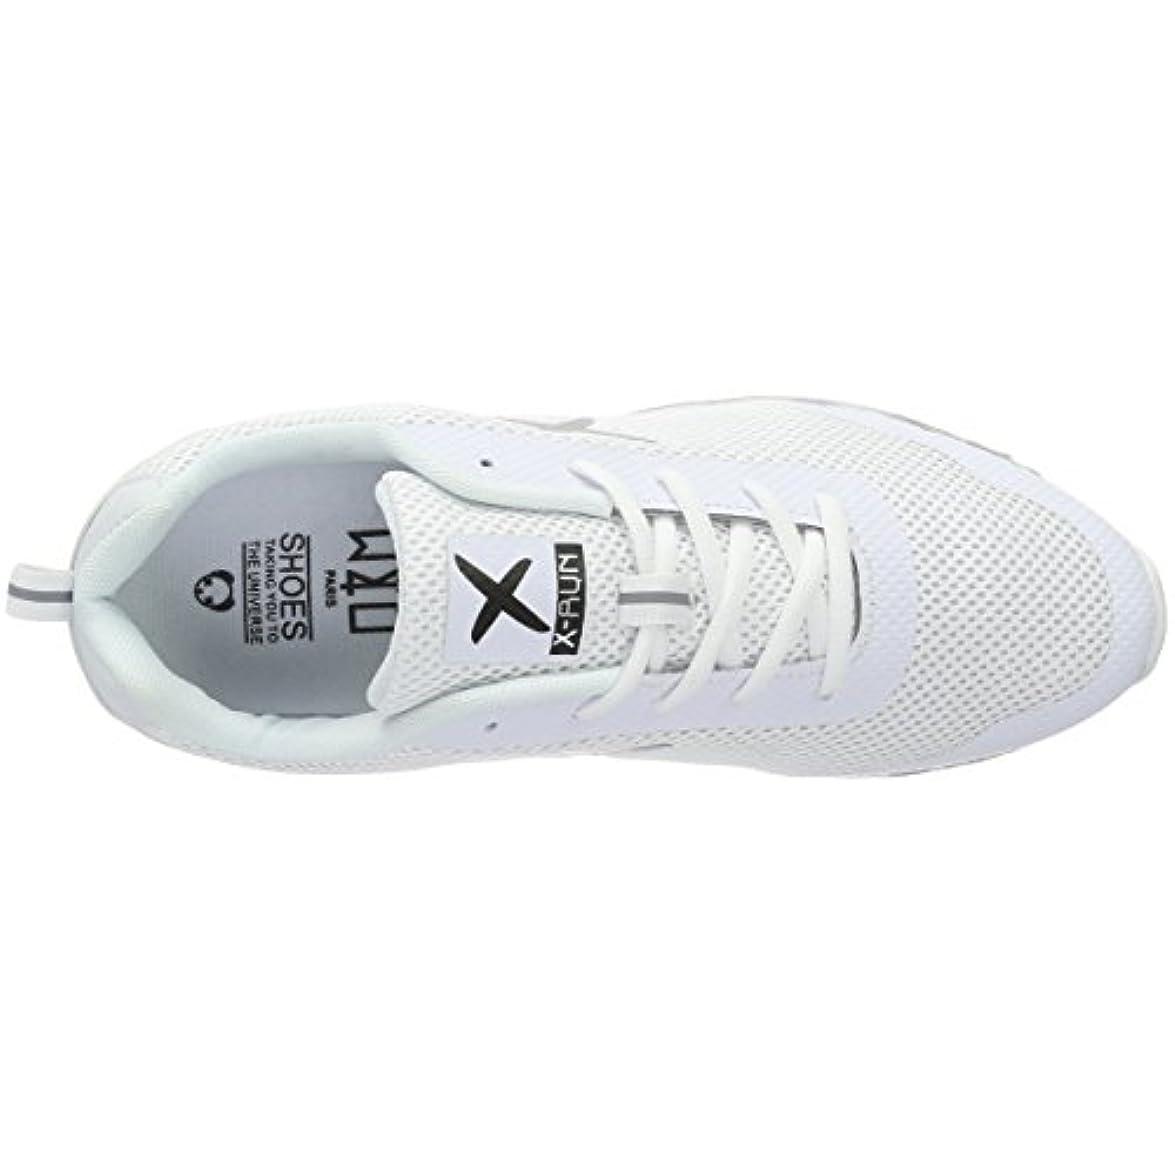 Wize amp; Ope - Xrun Sneaker Basse Unisex Adulto